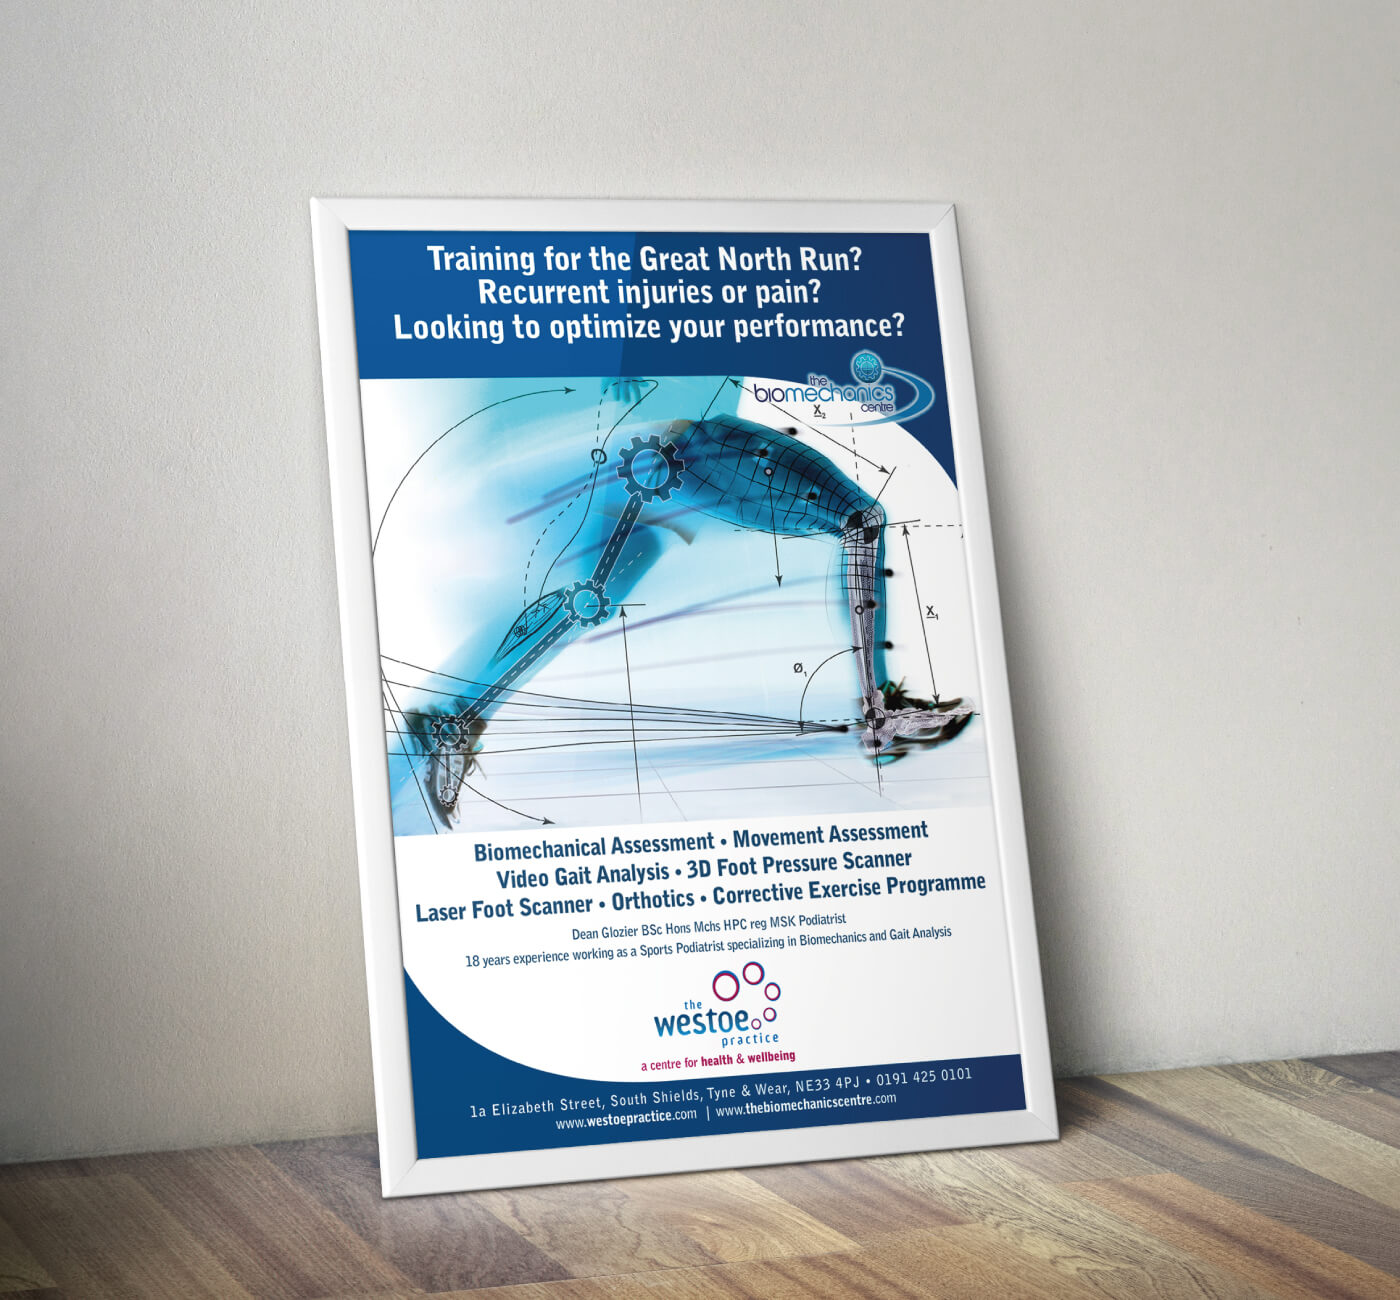 Westoe Practice Biomechanics Poster